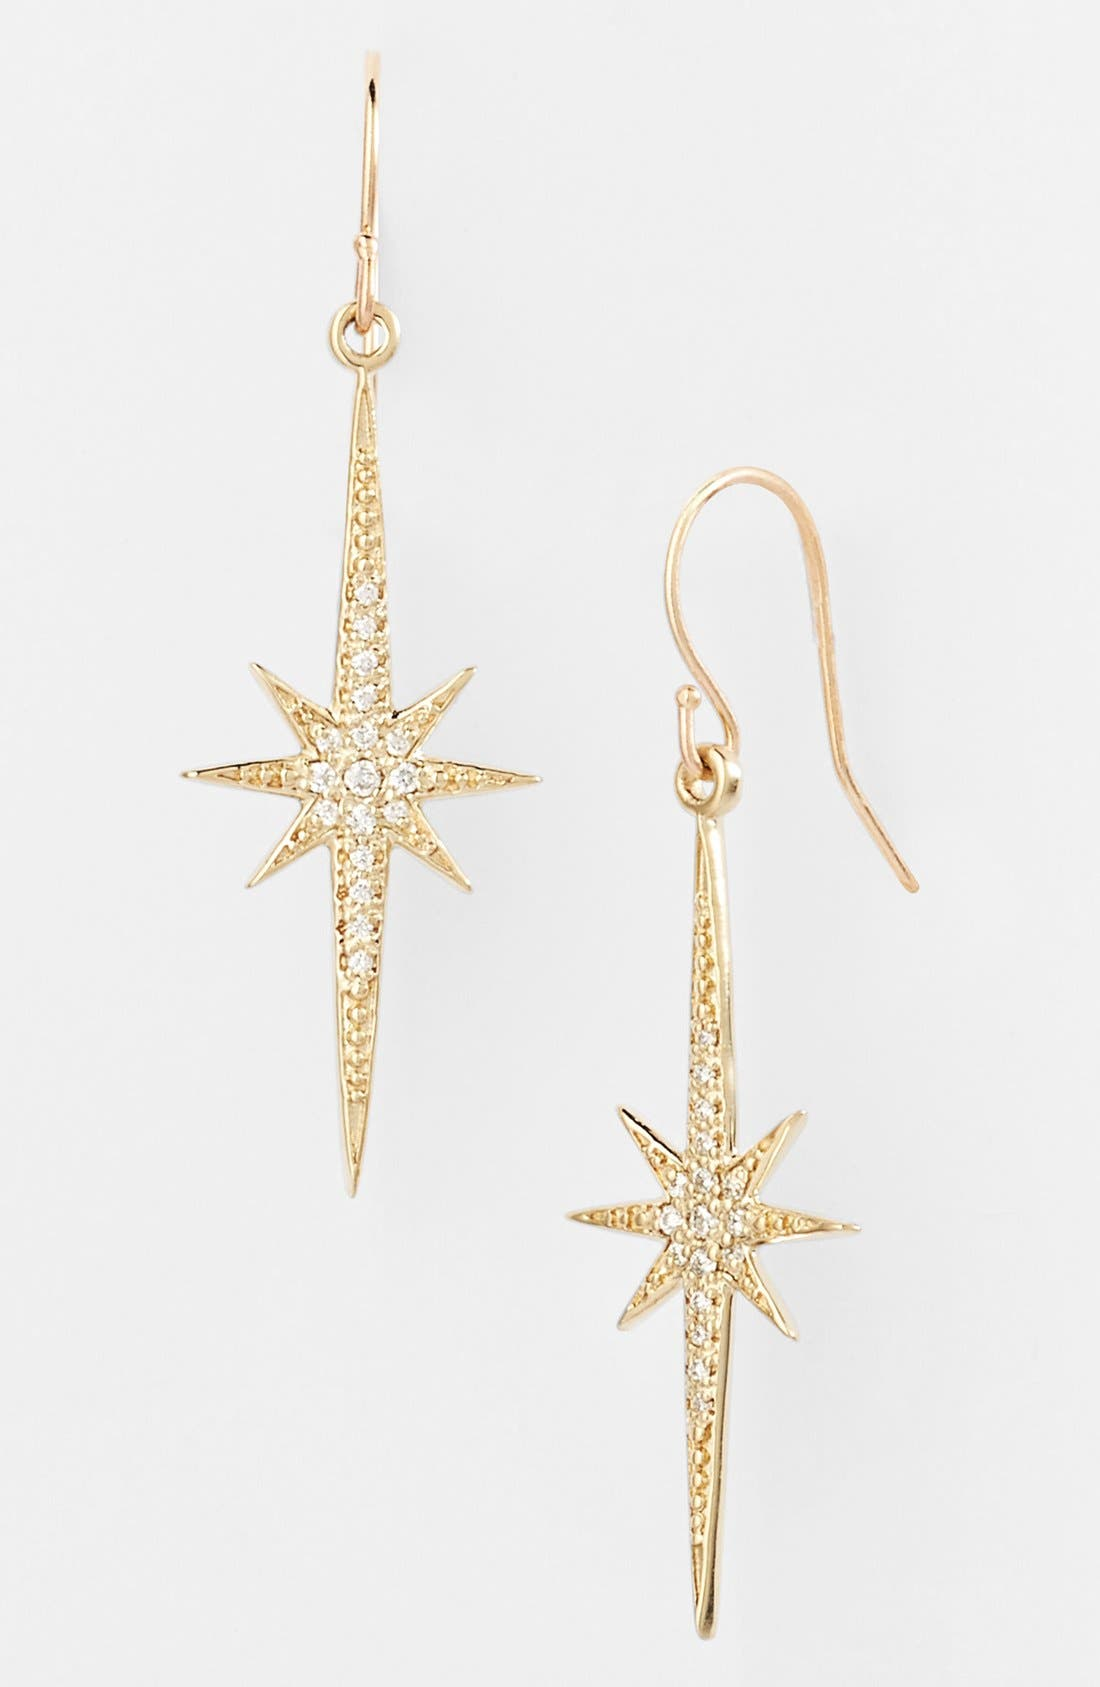 Alternate Image 1 Selected - Mizuki 'Icicles' Starburst Drop Earrings